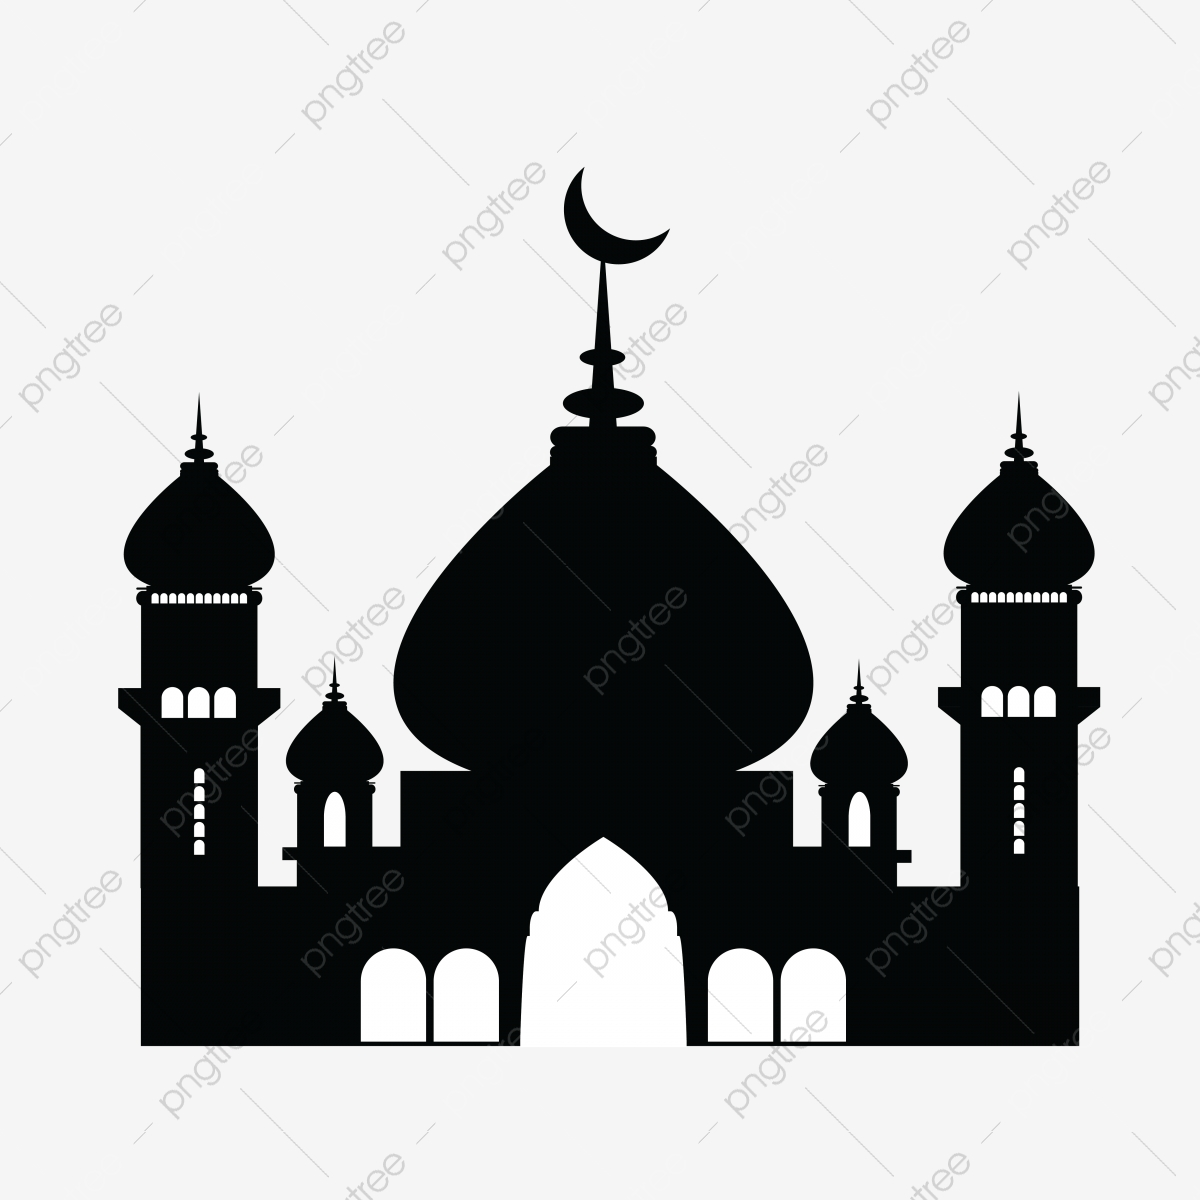 Mosque Clipart Png Vector, Masajed, Moon Eid, Muslim